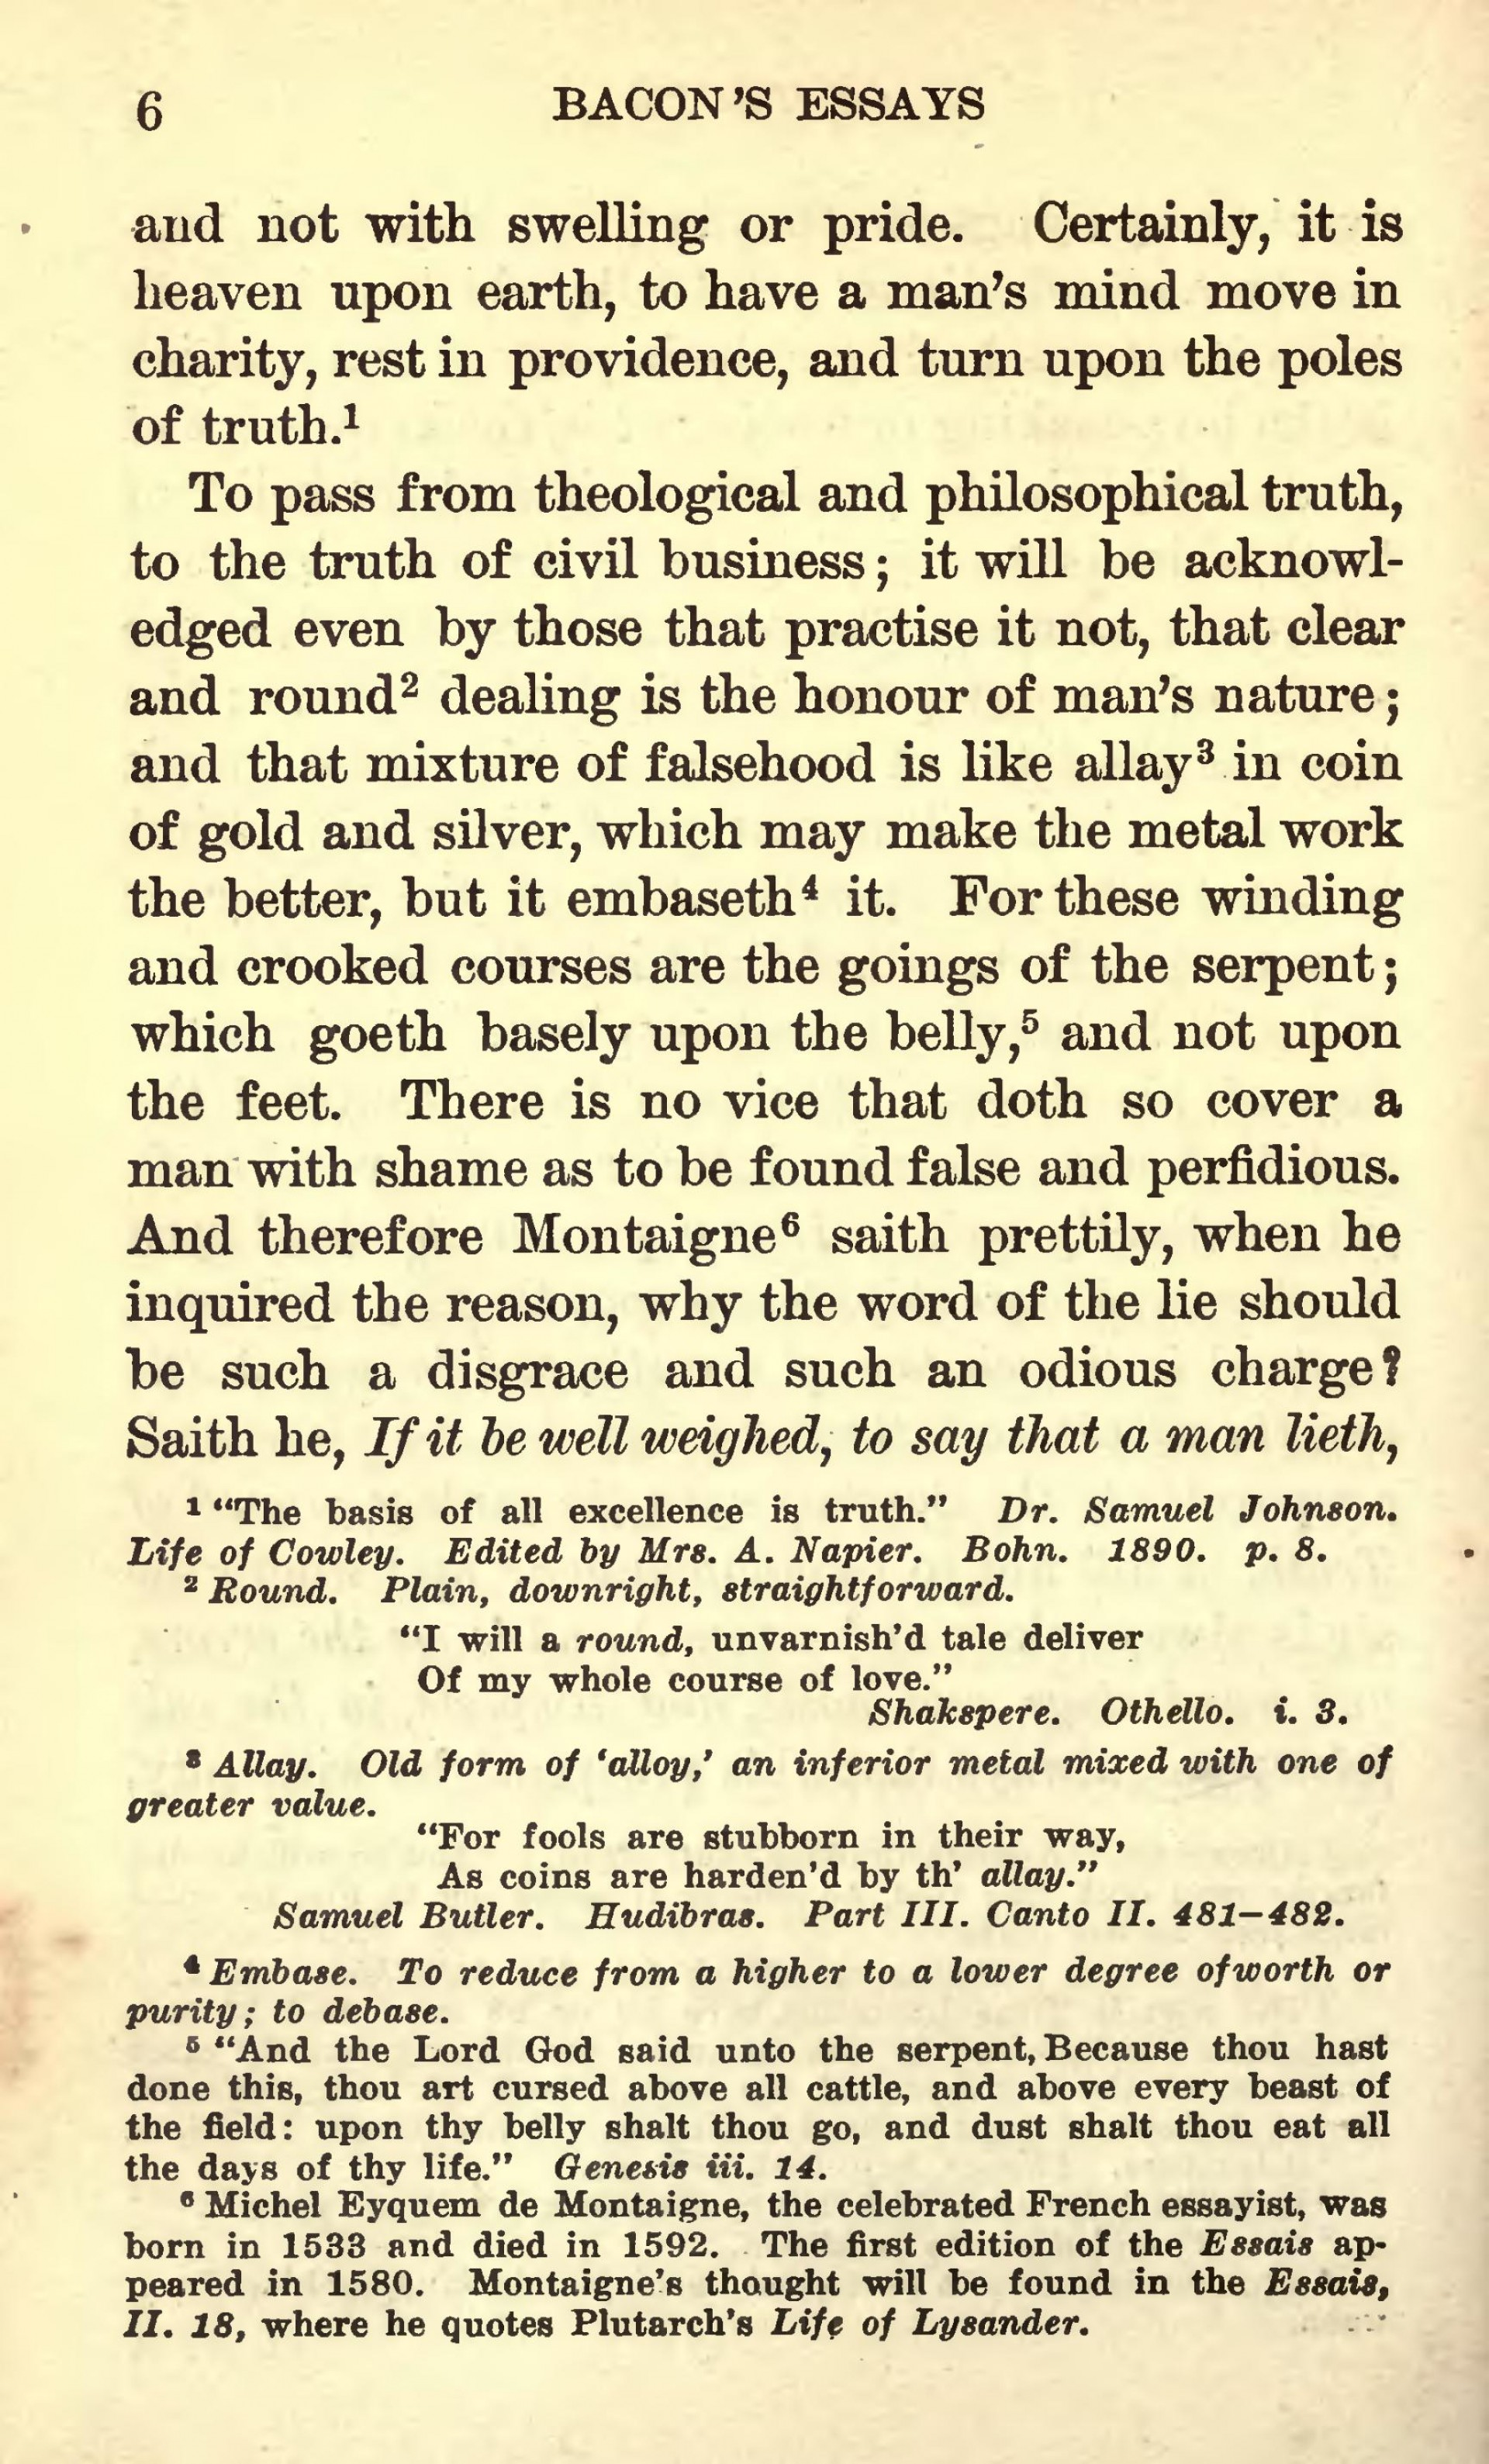 009 Page116 1728px Of Francis Bacon 1908 Scott Djvu Essay Example Bacons Amazing Essays In Urdu Pdf Truth Summary 1920